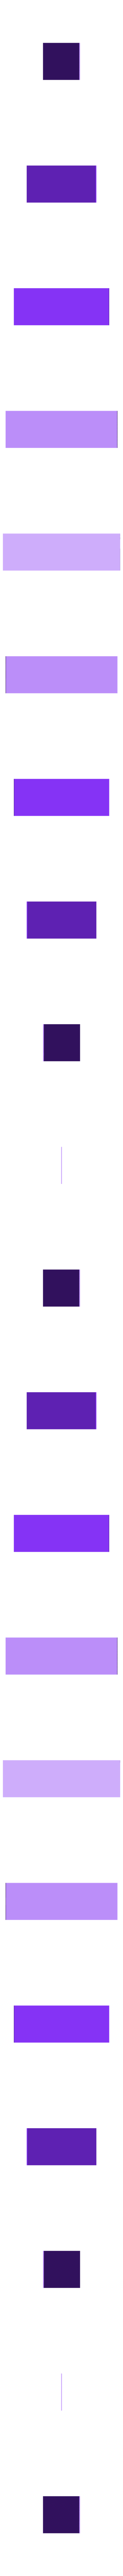 pol'1.STL Download free STL file # LIFEHACK3D-cajamuchiforma • Model to 3D print, izanferrco